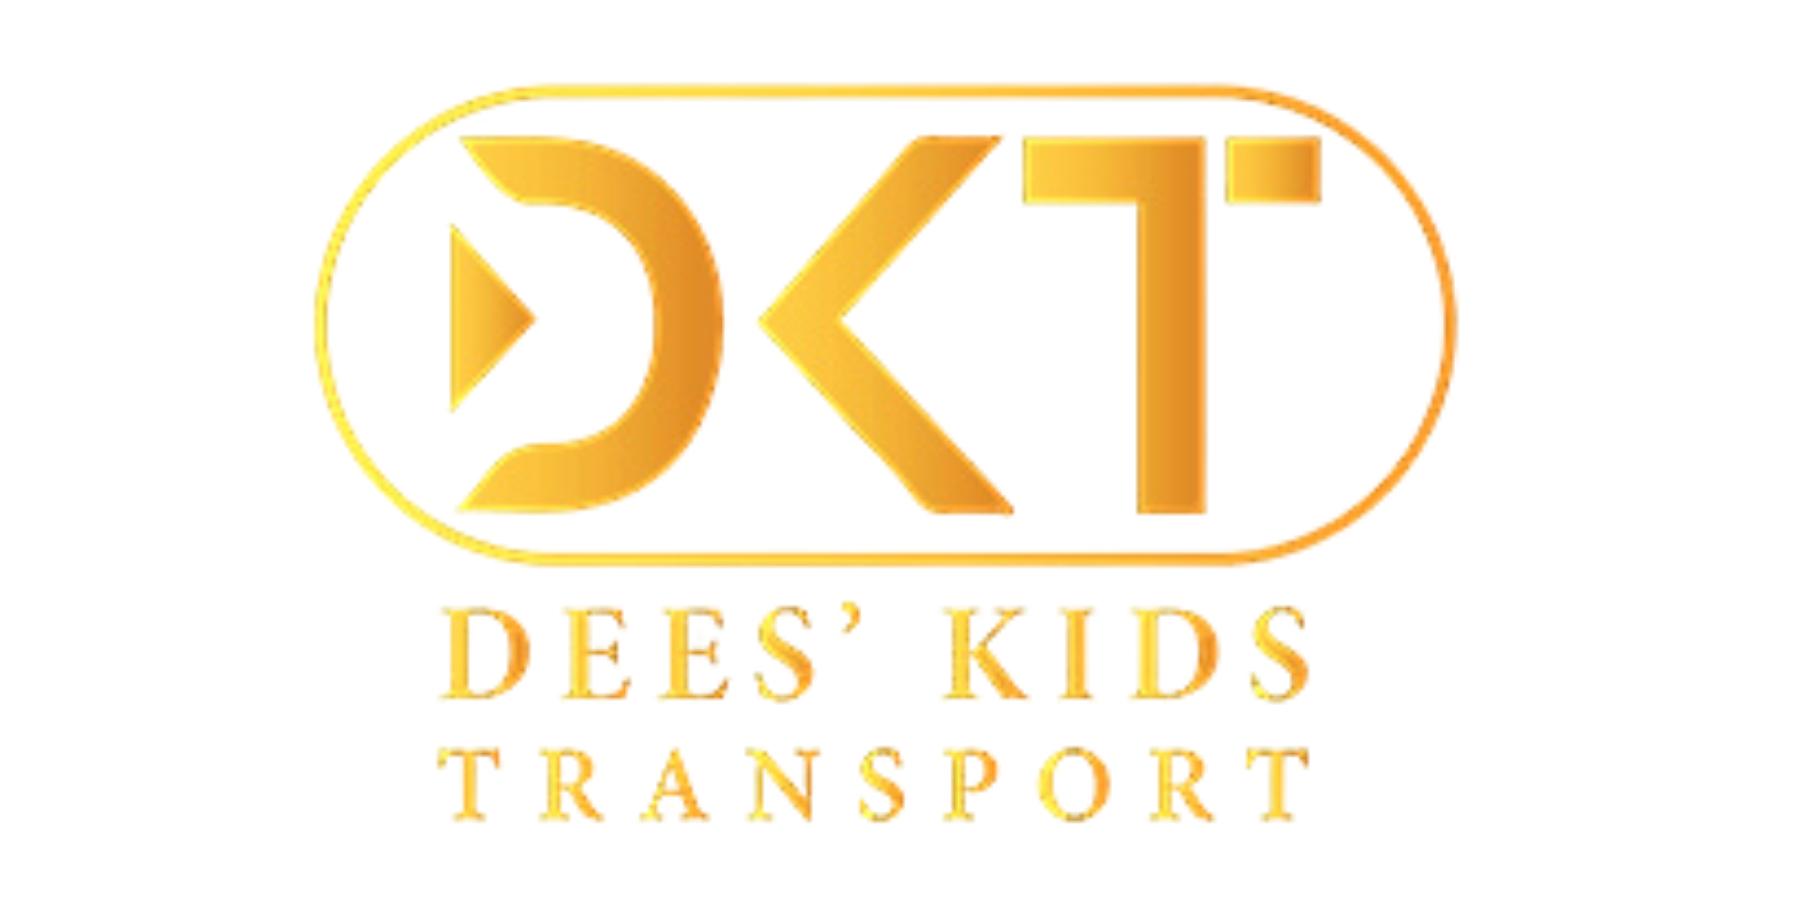 Dee's Kids Transporation